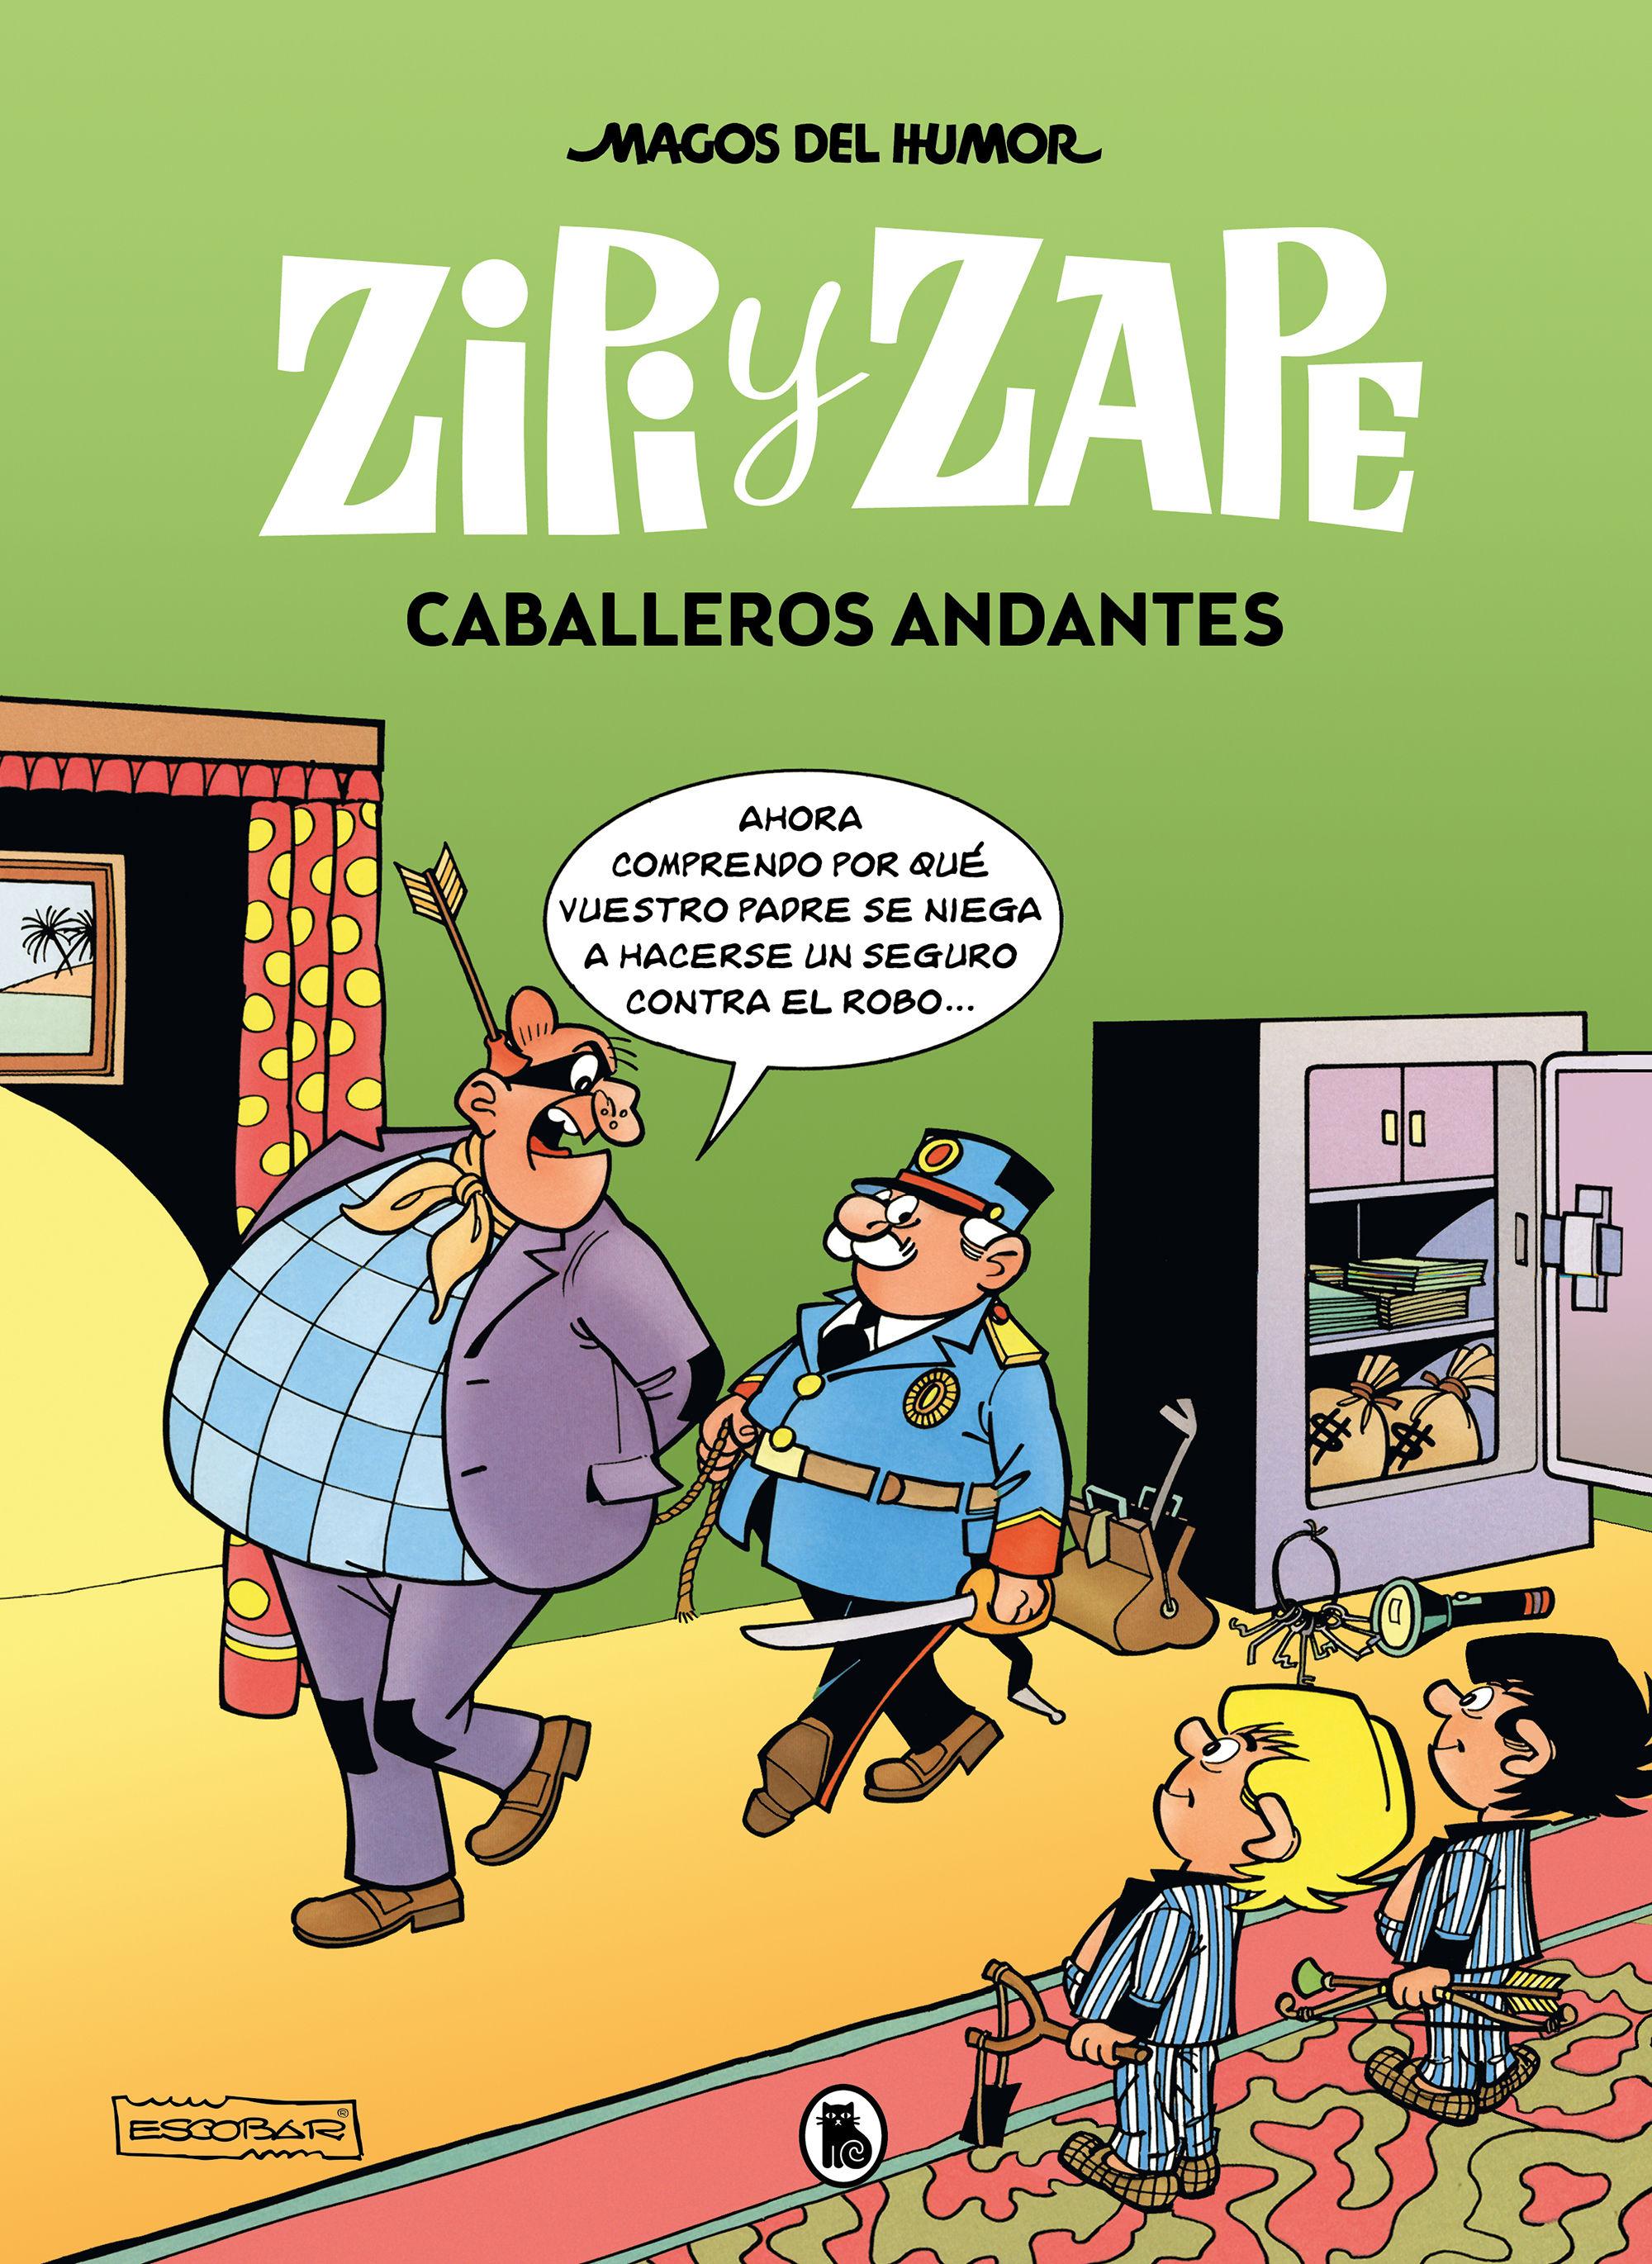 MAGOS DEL HUMOR 210 ZIPI ZAPE CABALLEROS